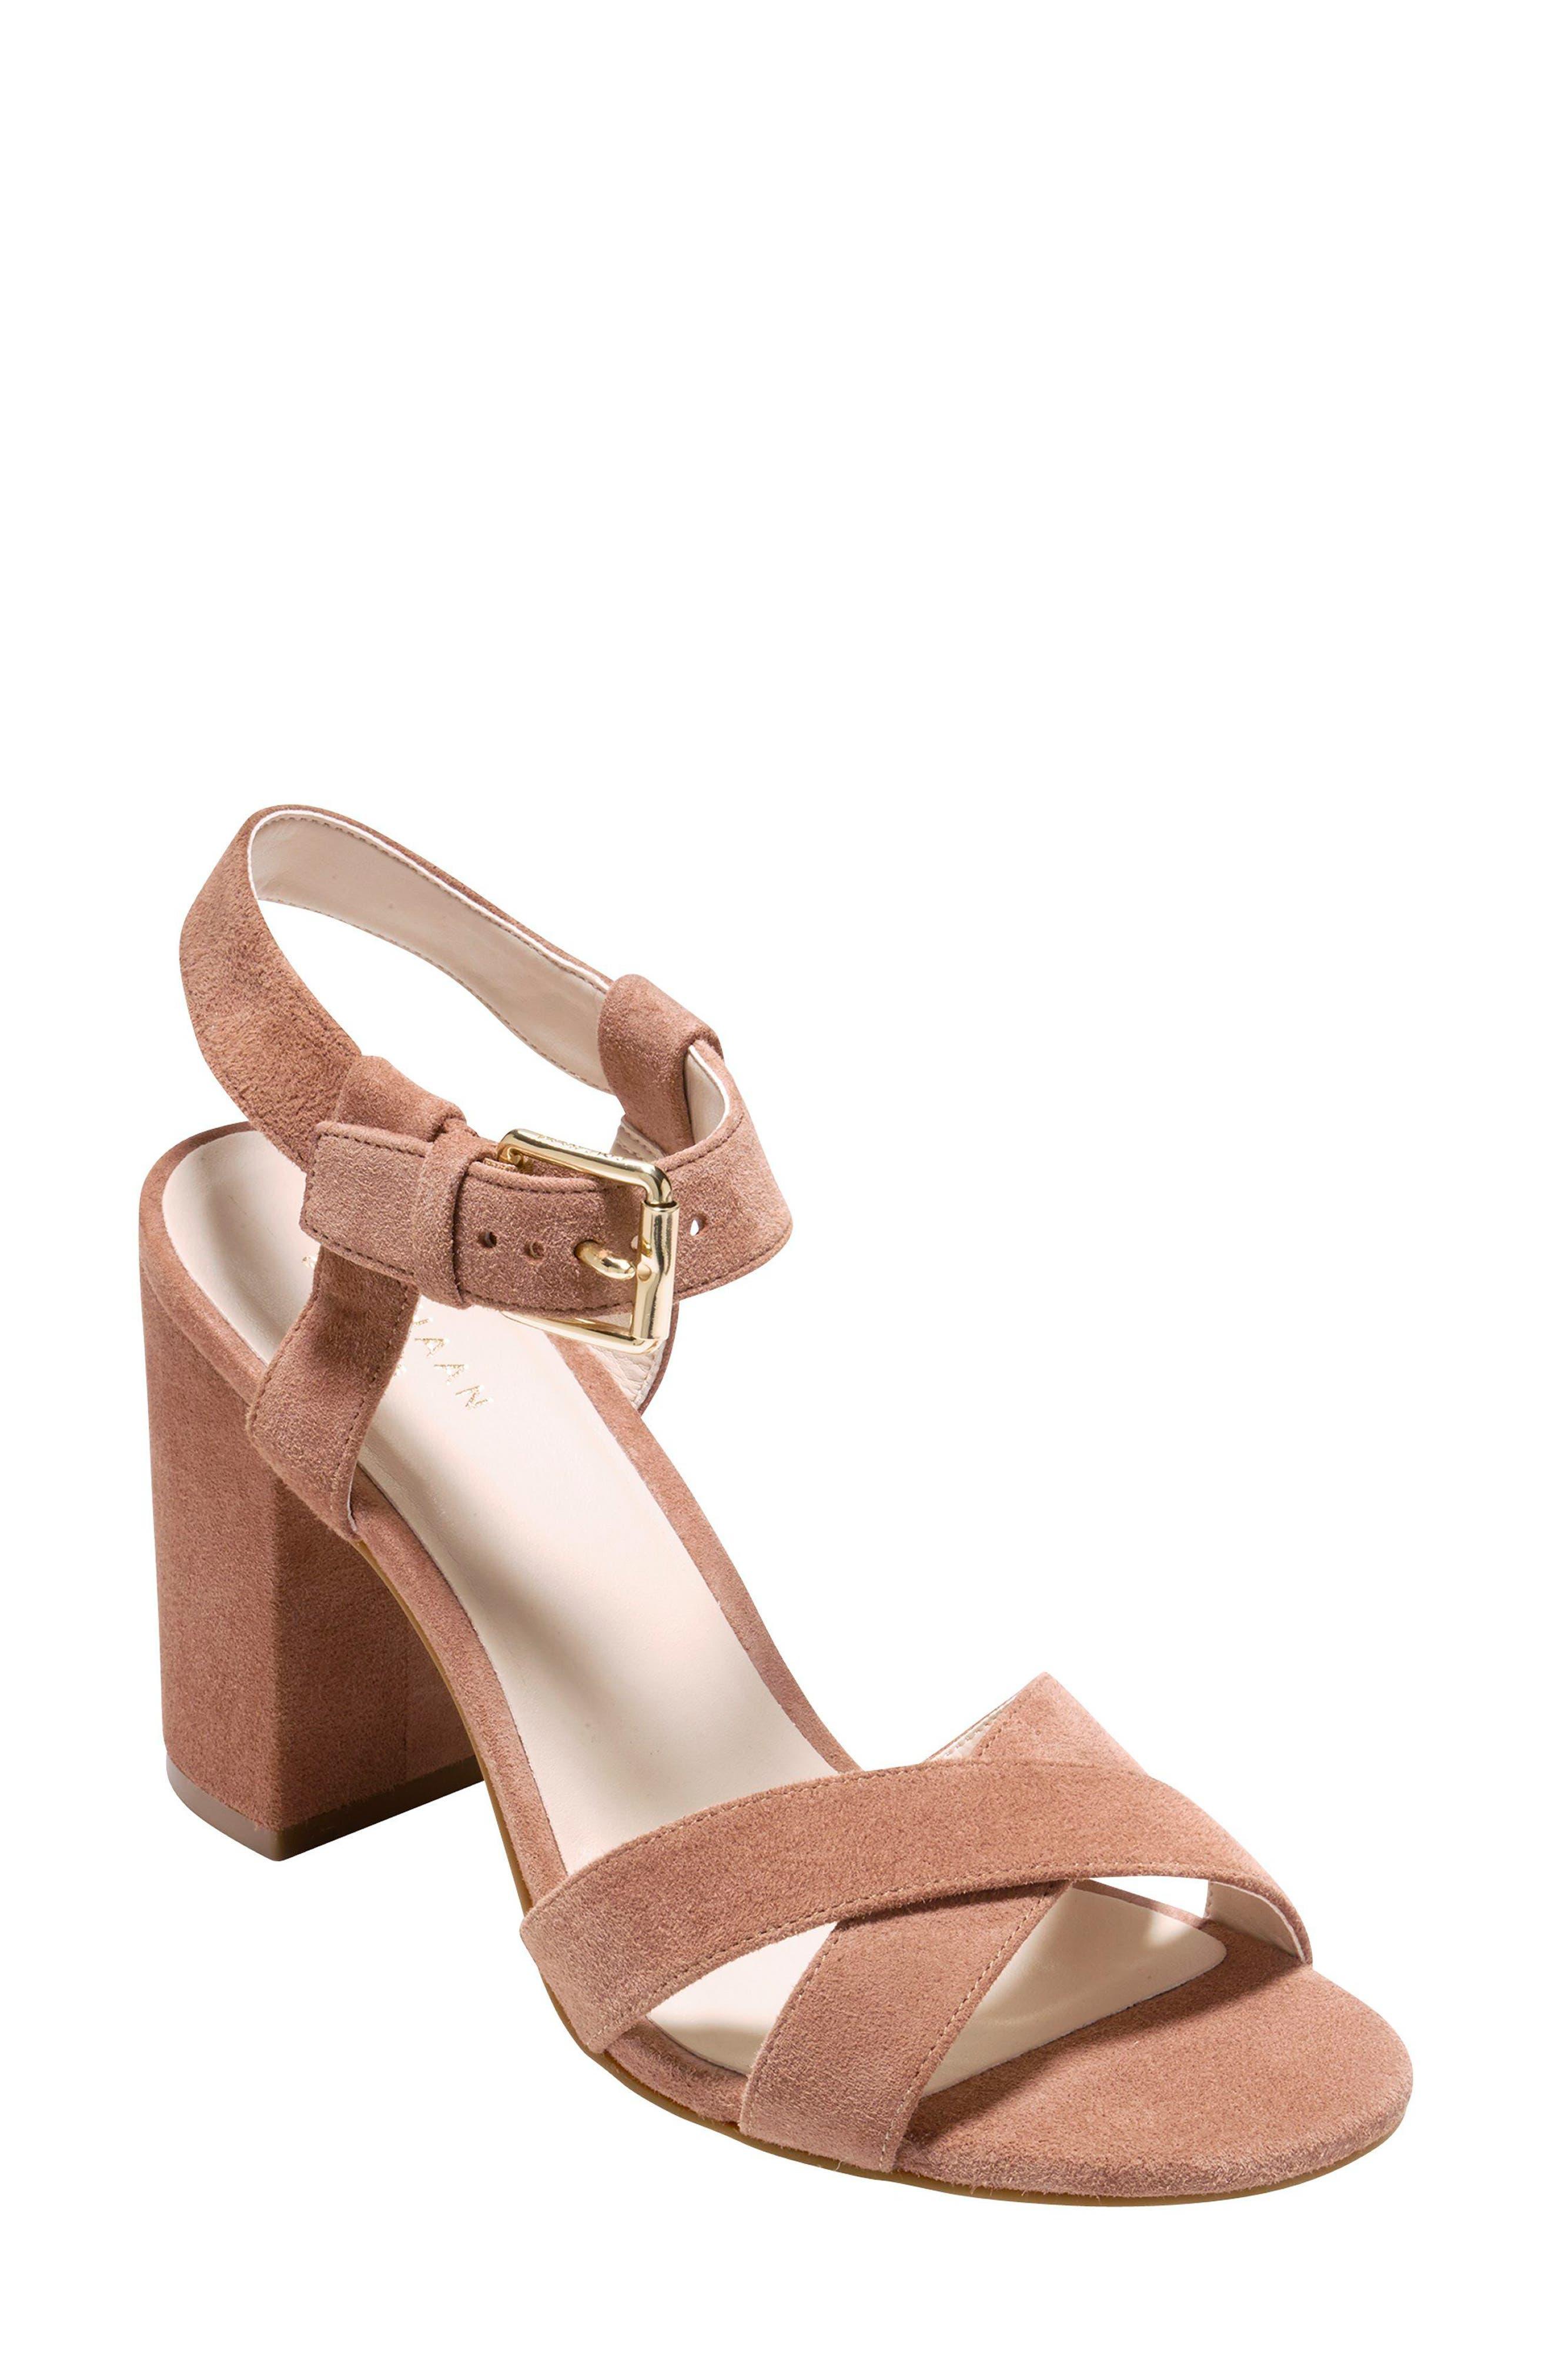 Main Image - Cole Haan Kadi Ankle Strap Sandal (Women)